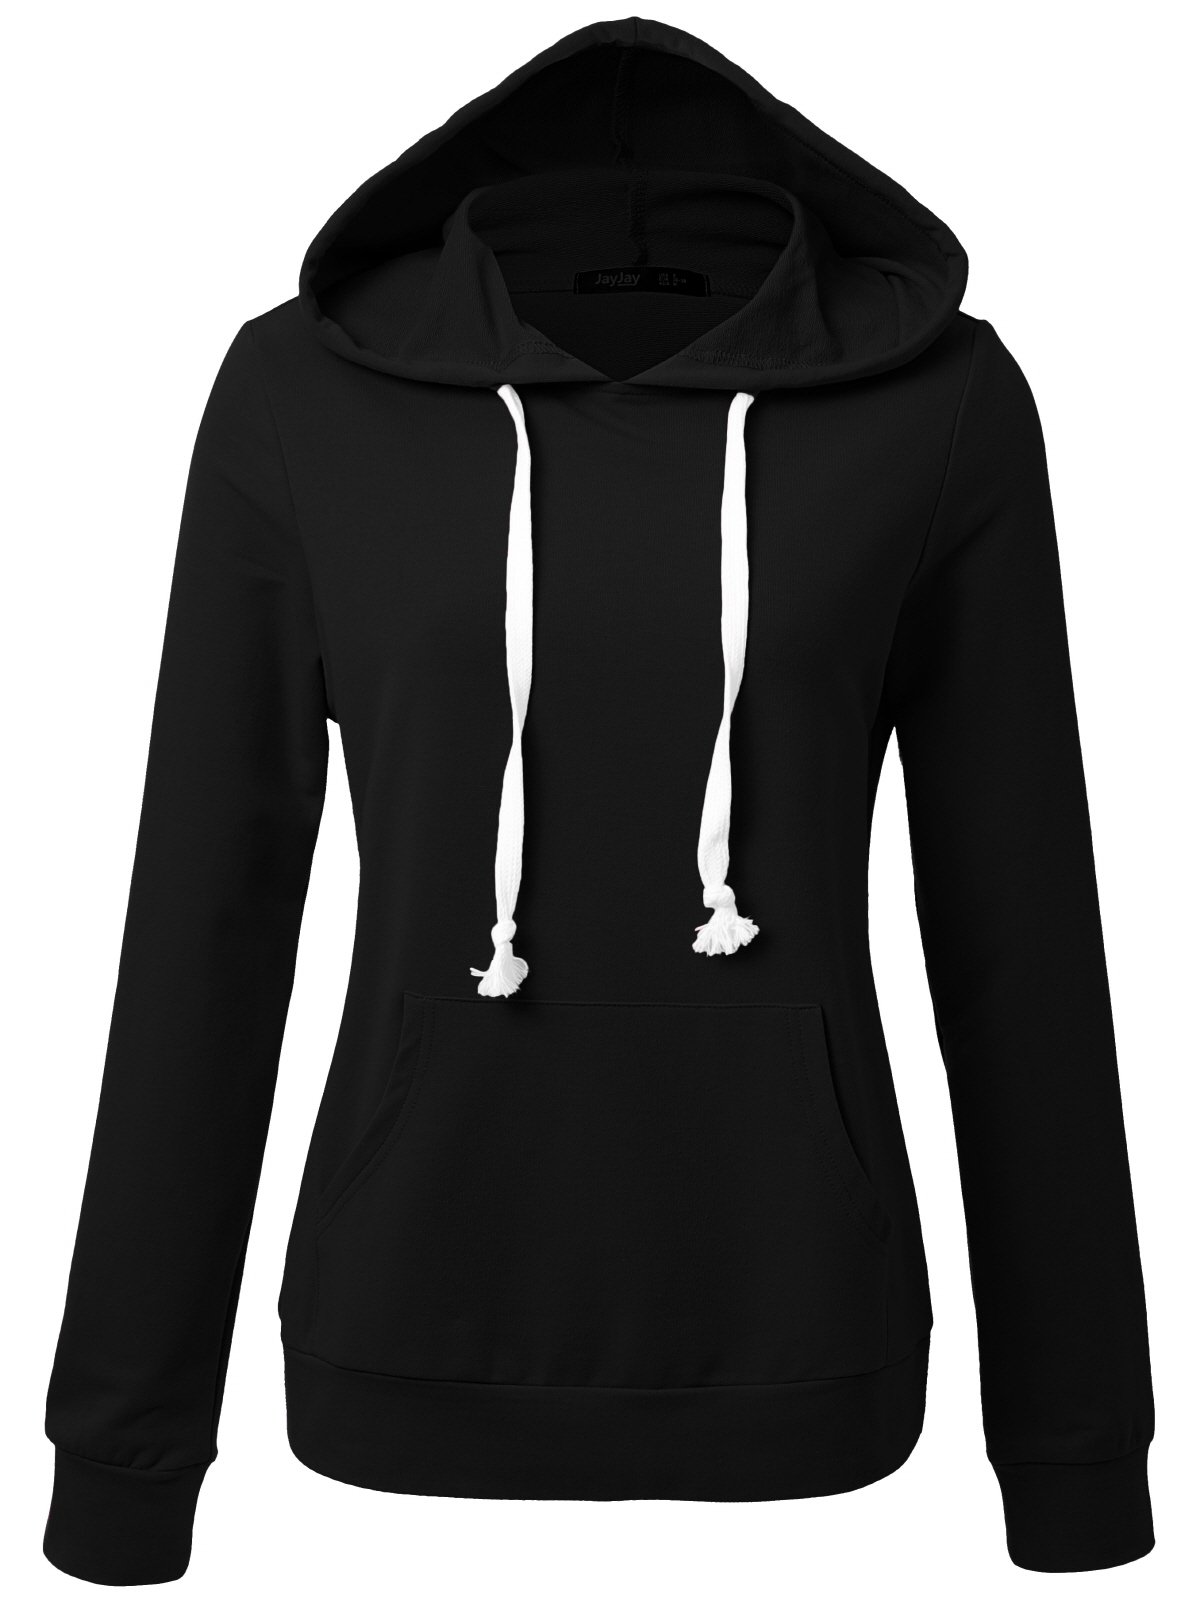 JayJay Women Long Sleeve Lightweight Casual Pullover Hoodie Sweatshirts With Kangaroo Pocket,Black,2XL